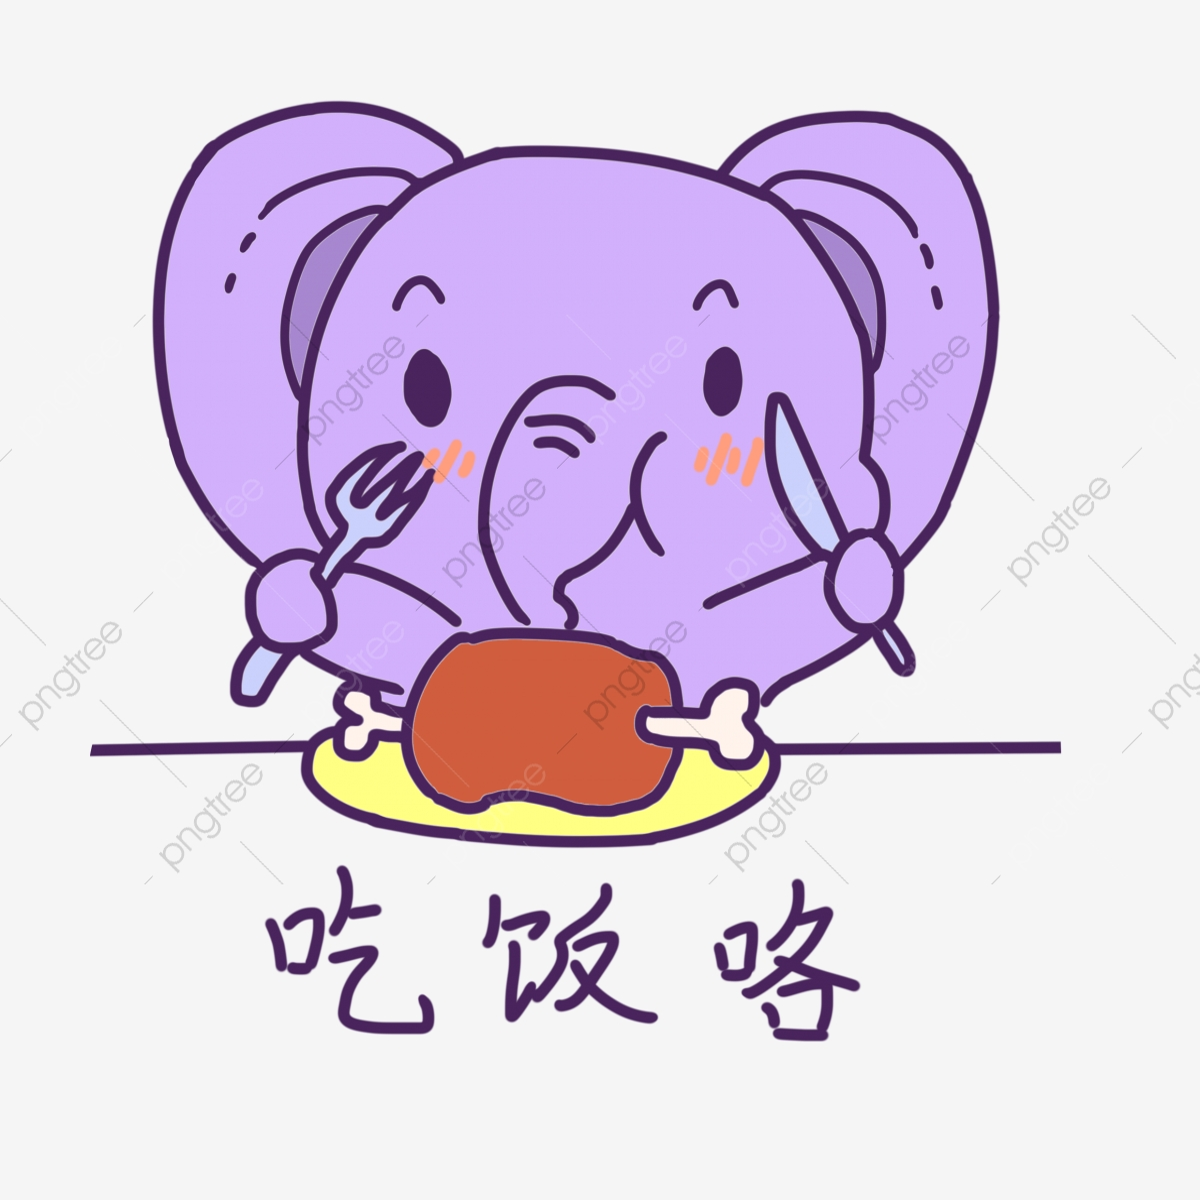 Expresion Cena Hermano Elefante De Dibujos Animados Paquete